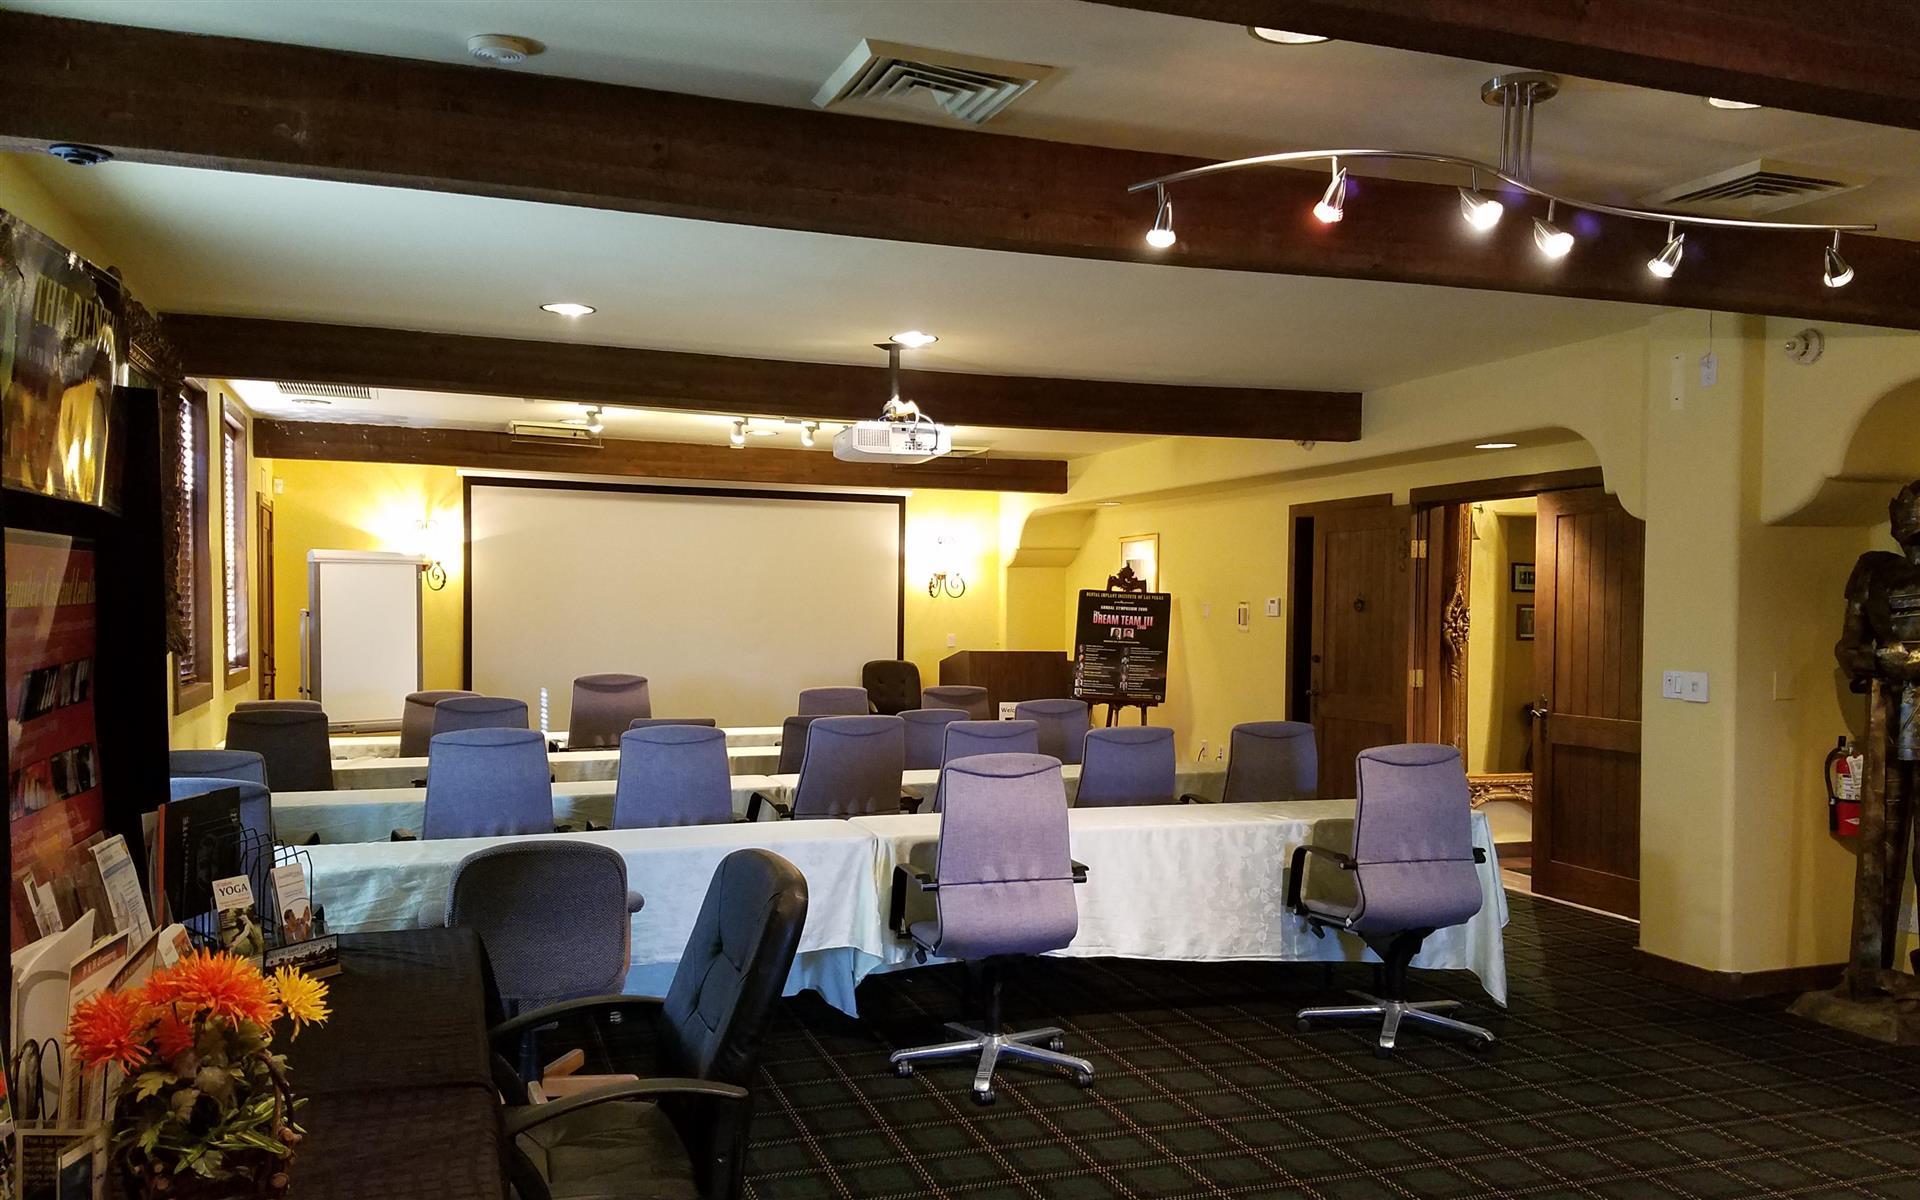 Las Vegas Periodontal Care - Training/Seminar Room